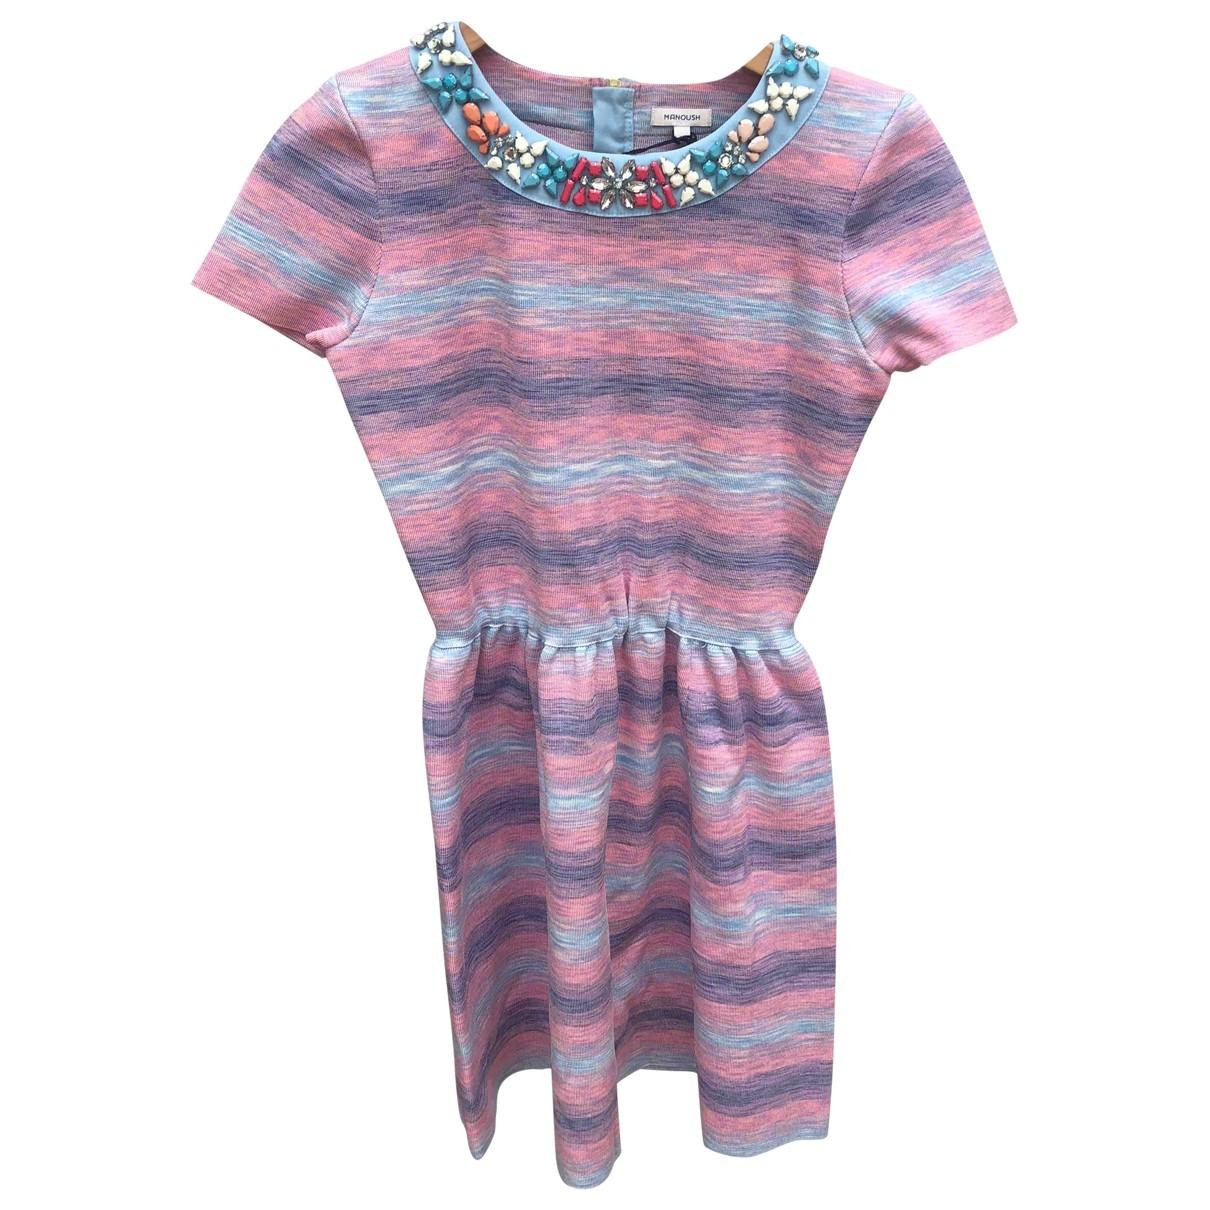 Manoush \N Pink Cotton - elasthane dress for Women 36 FR